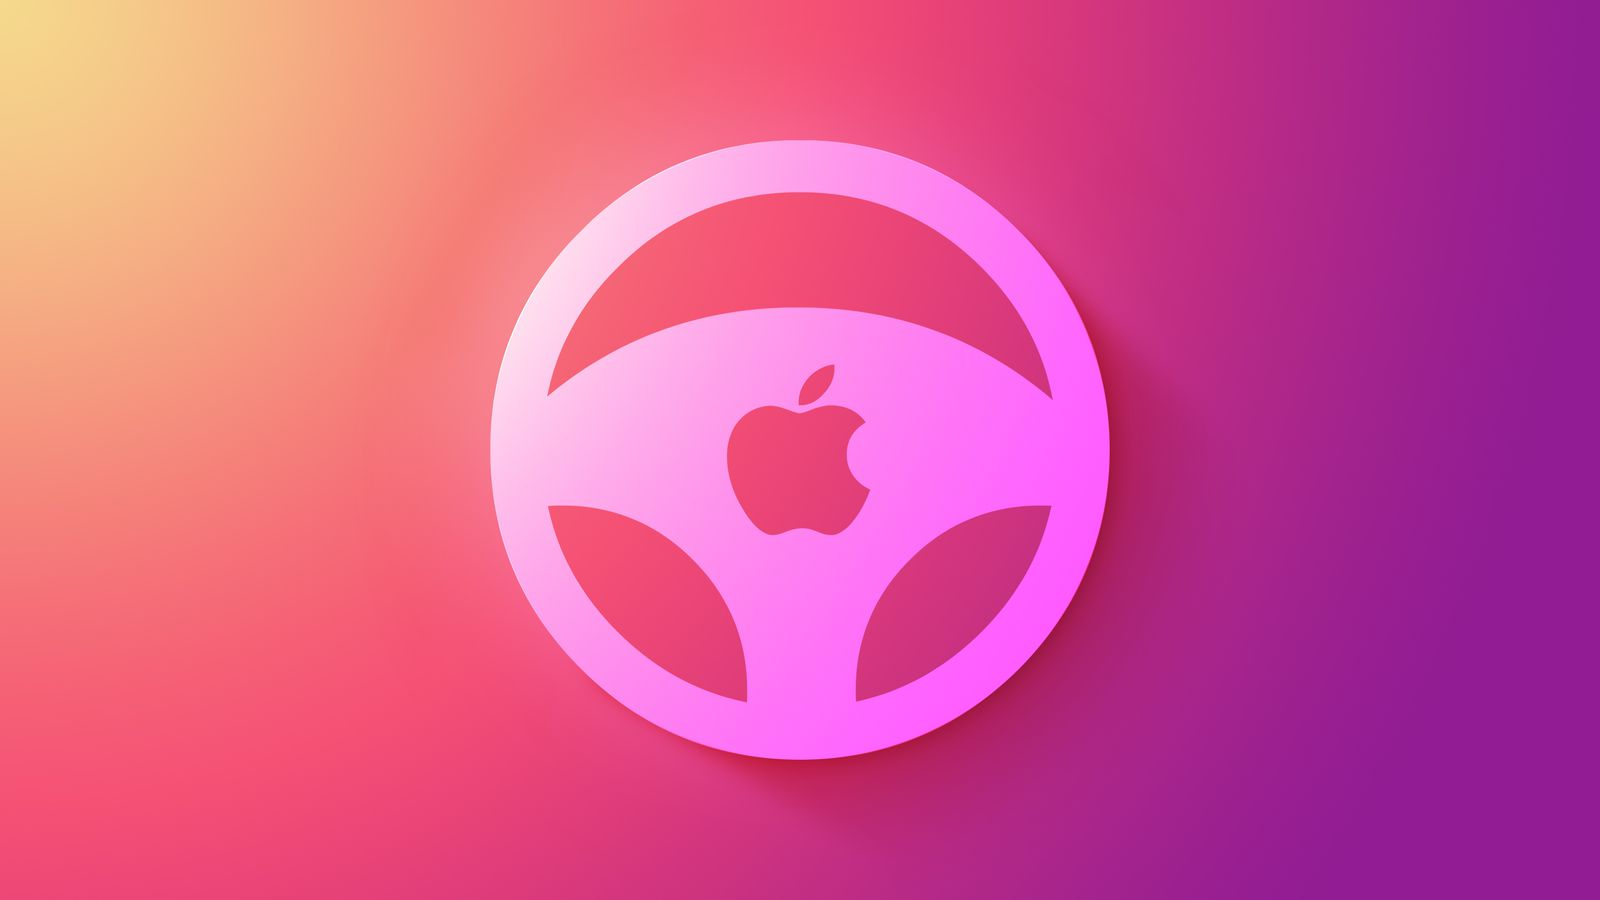 ساخت اپل کار